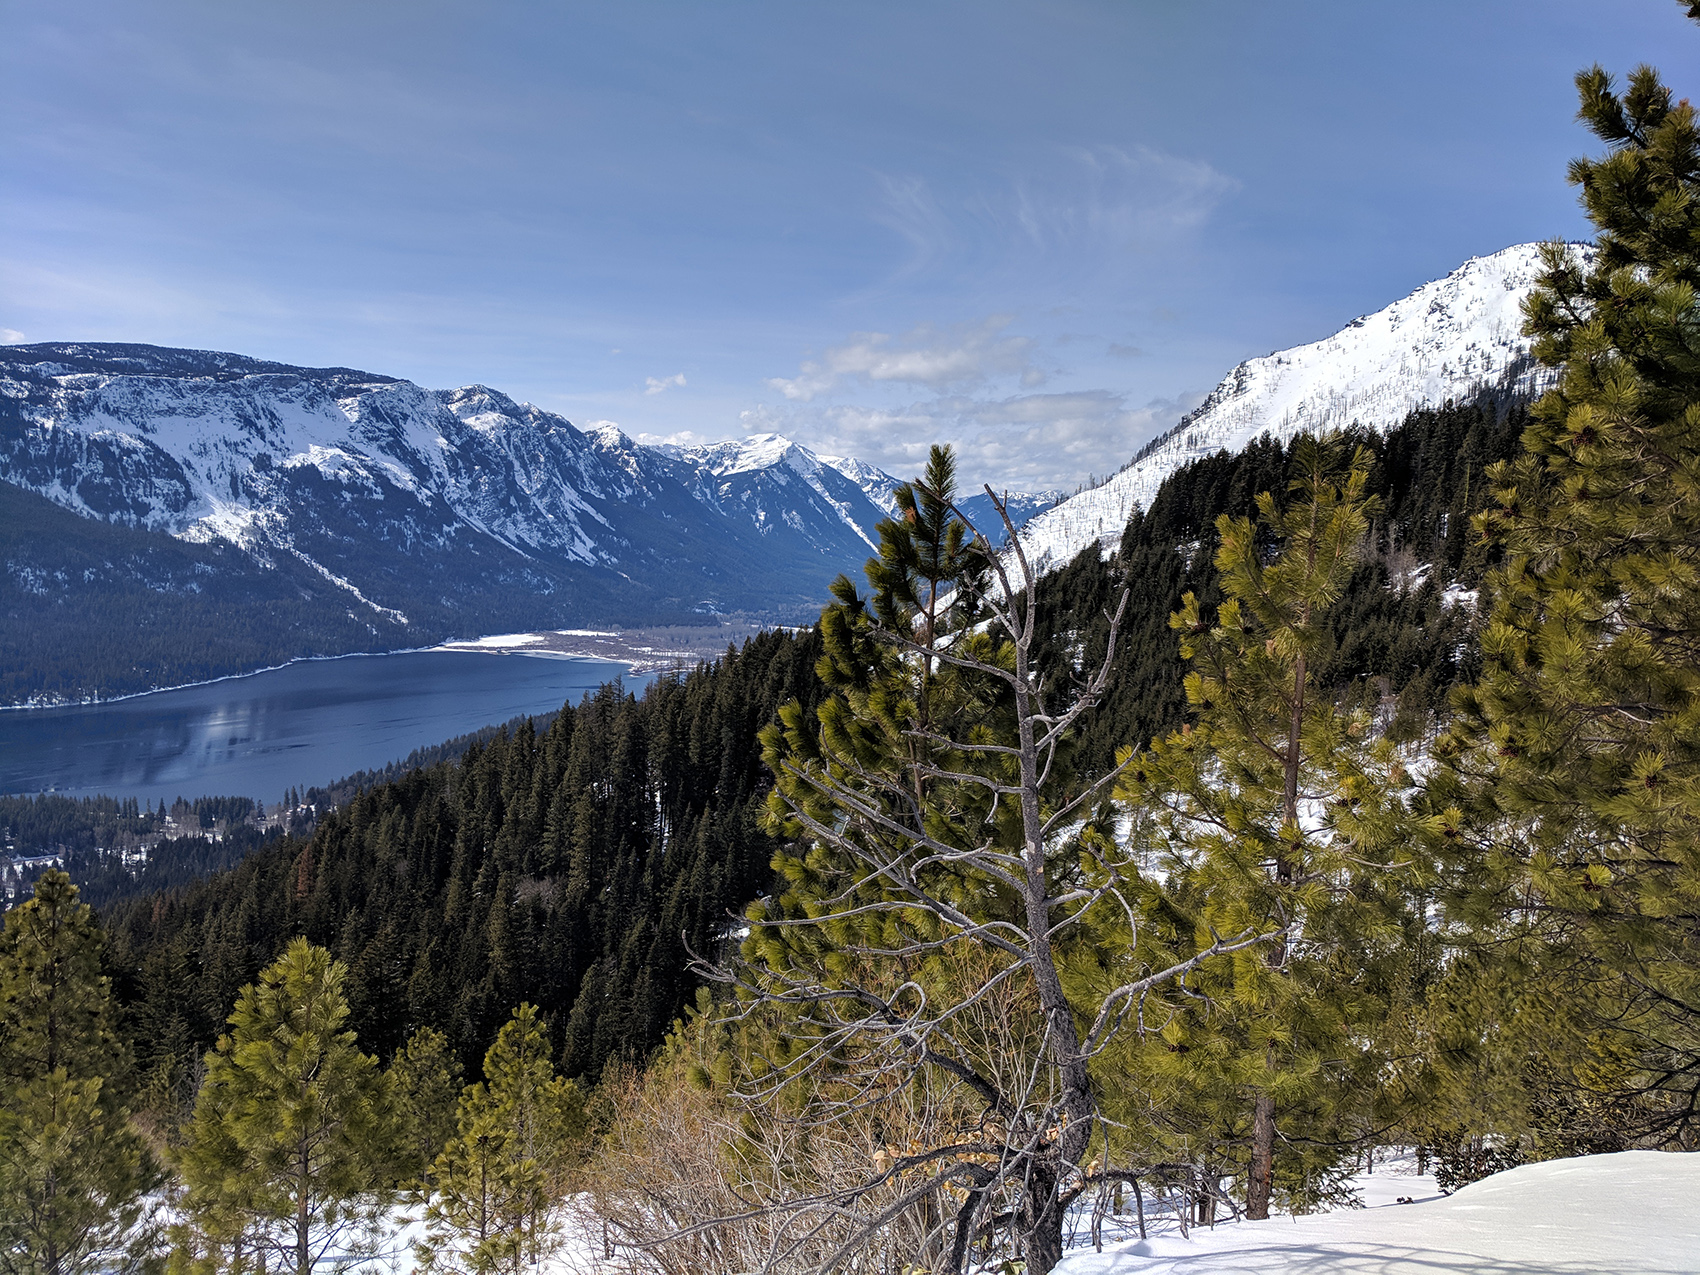 Leavenworth mountain view